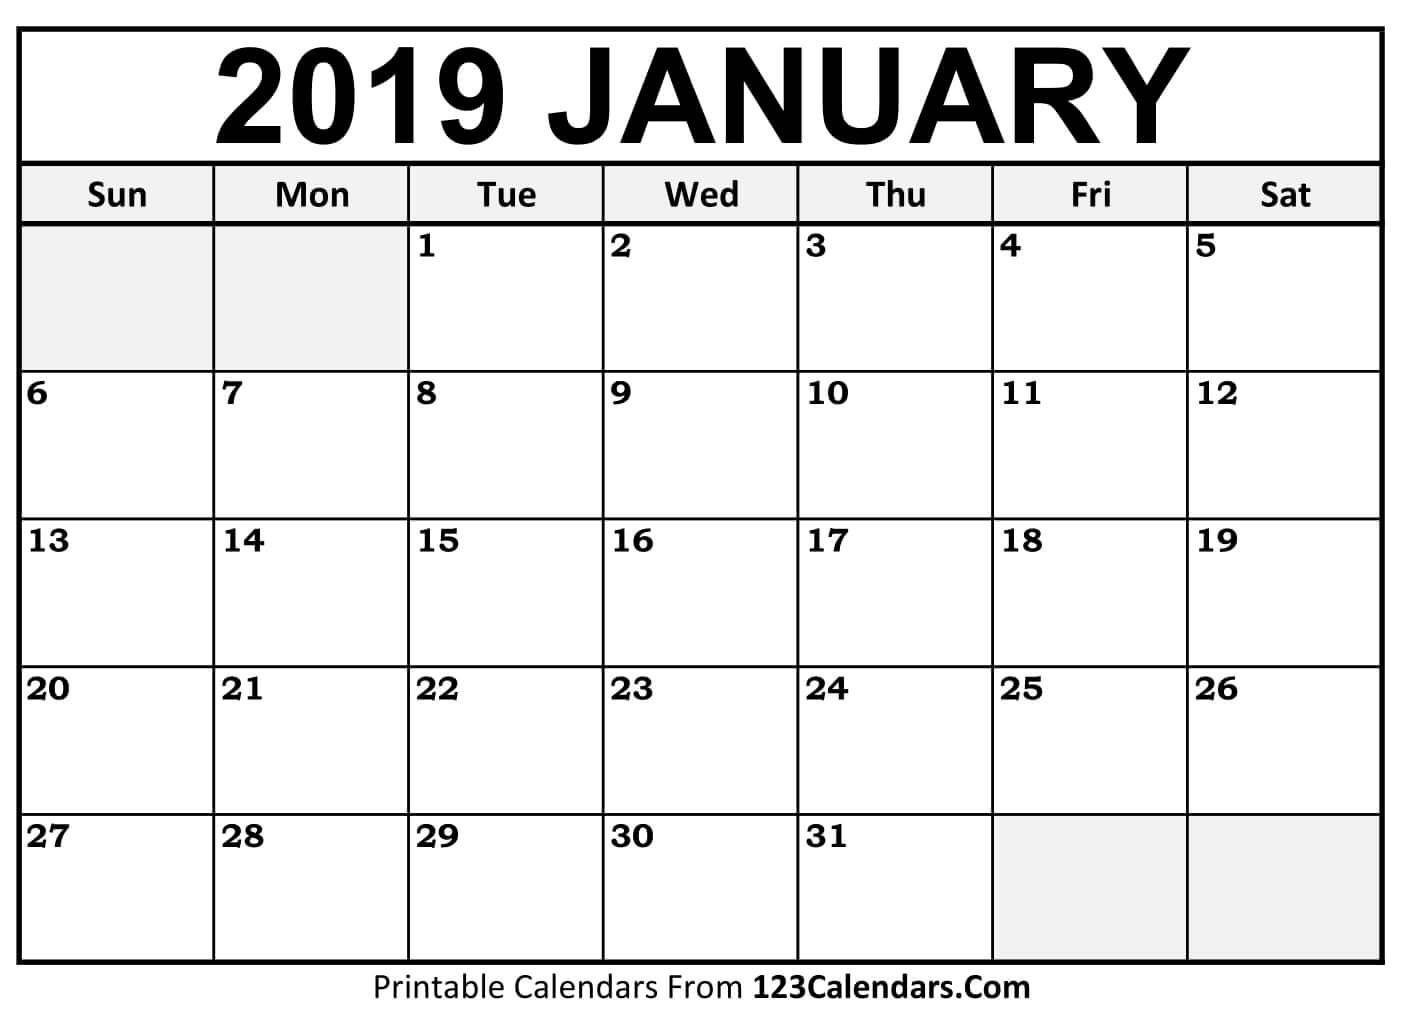 January Calendar 2019 | Blank January 2019 Calendar Printable Free inside Printable Calendar Templates August Through December